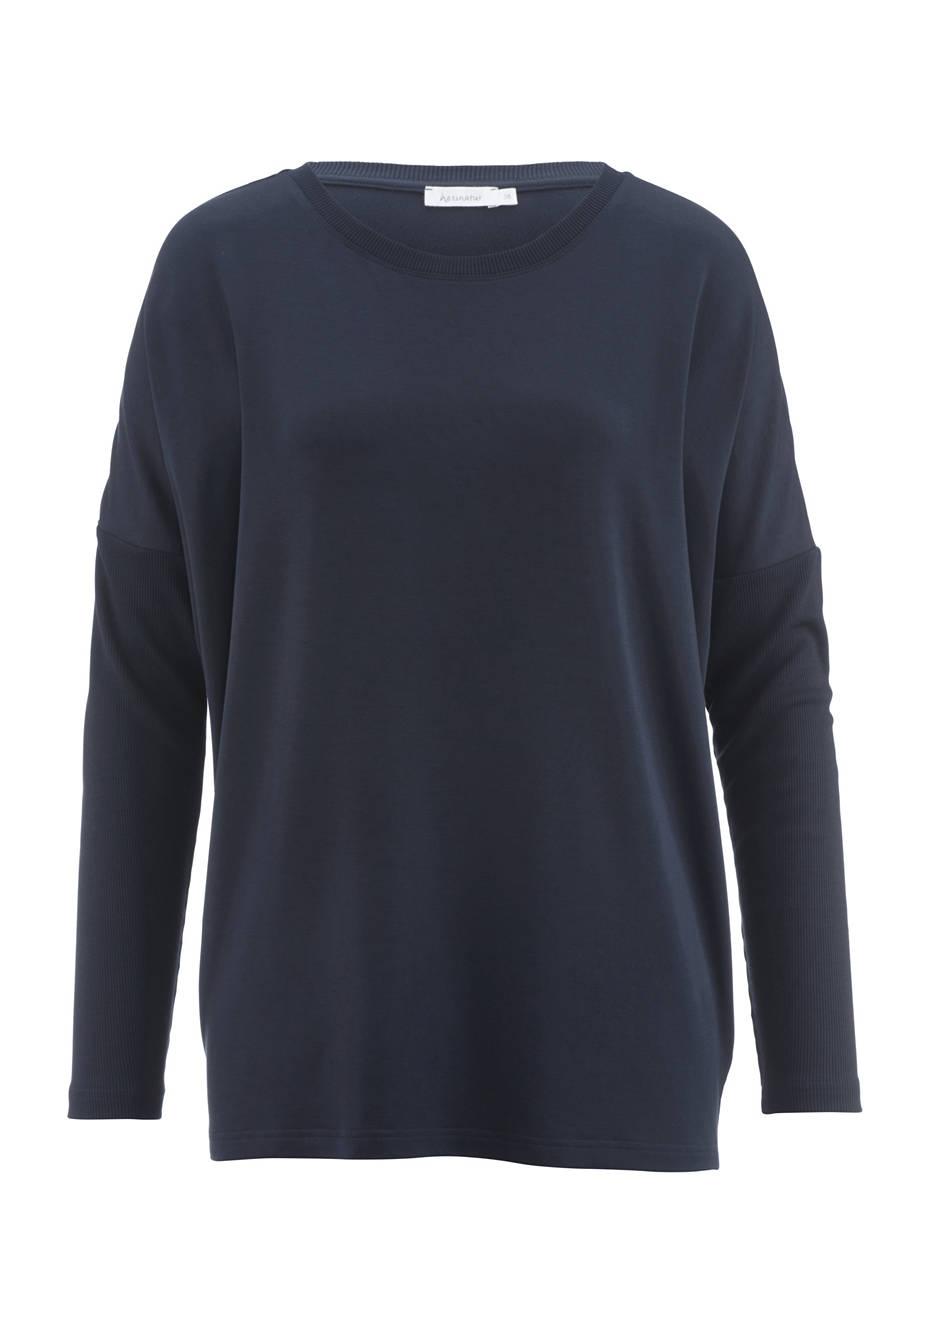 Sweatshirt aus Modal